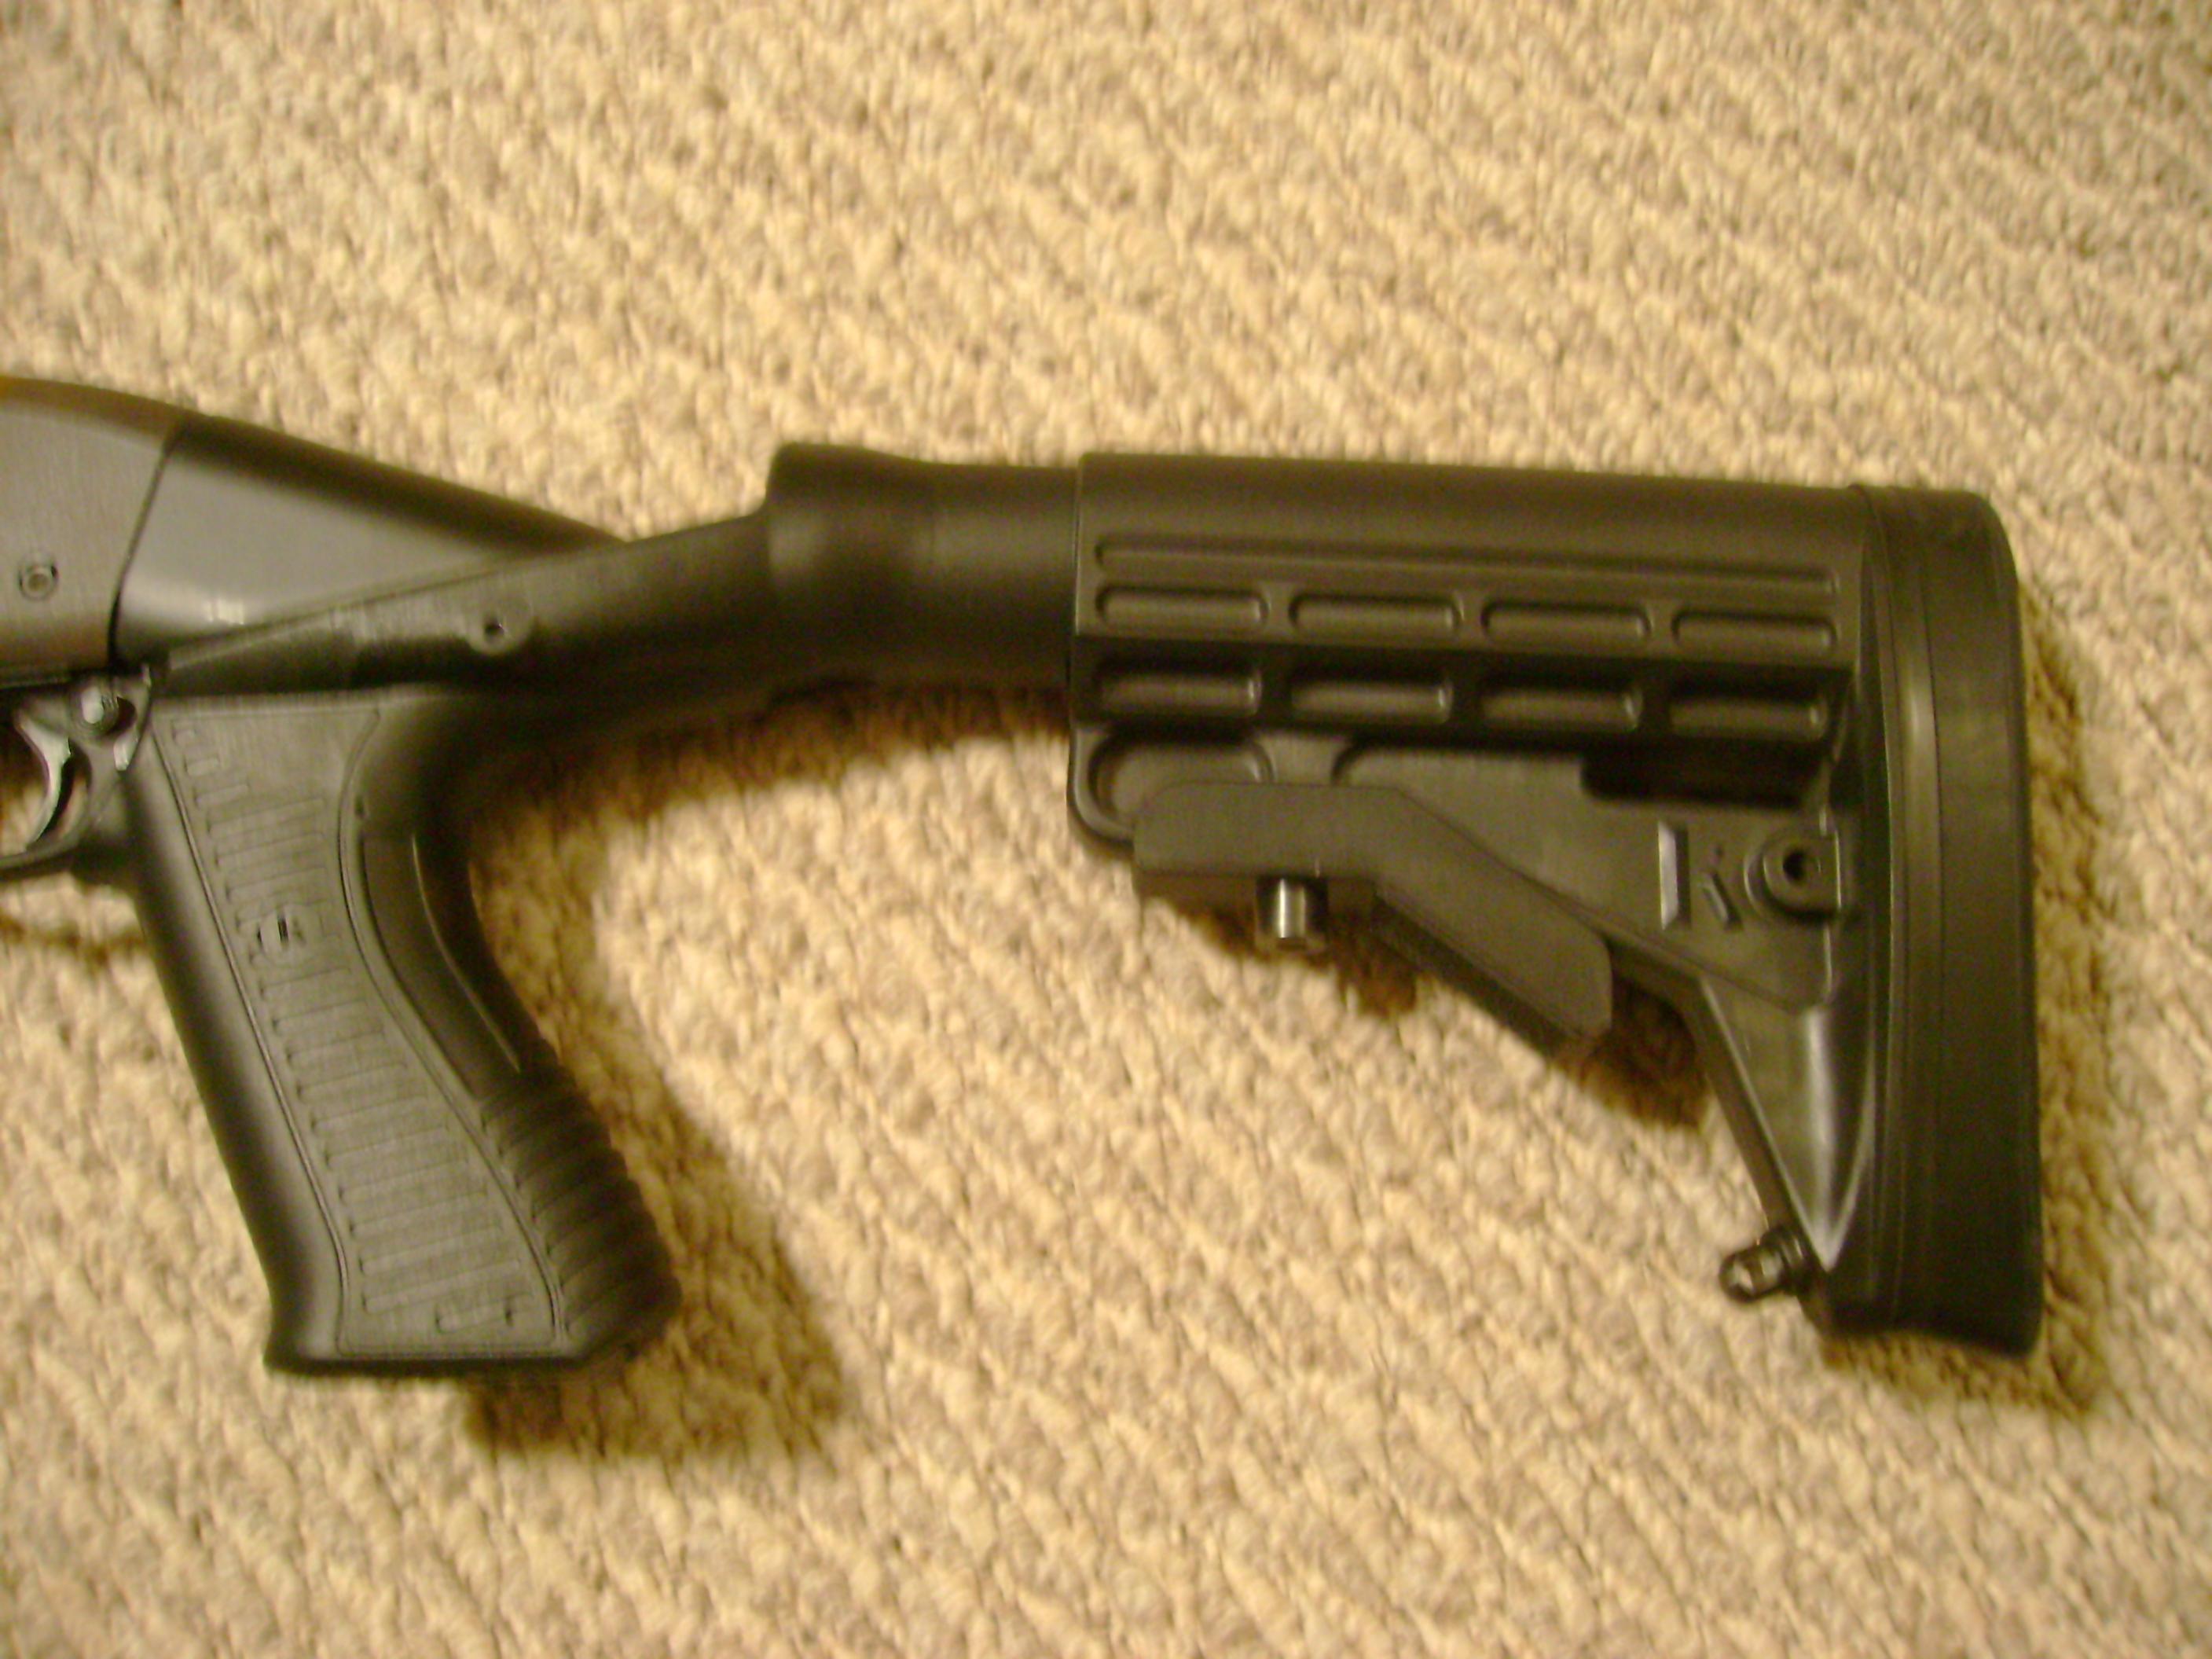 Shotgun for Home Defense-picture-004.jpg